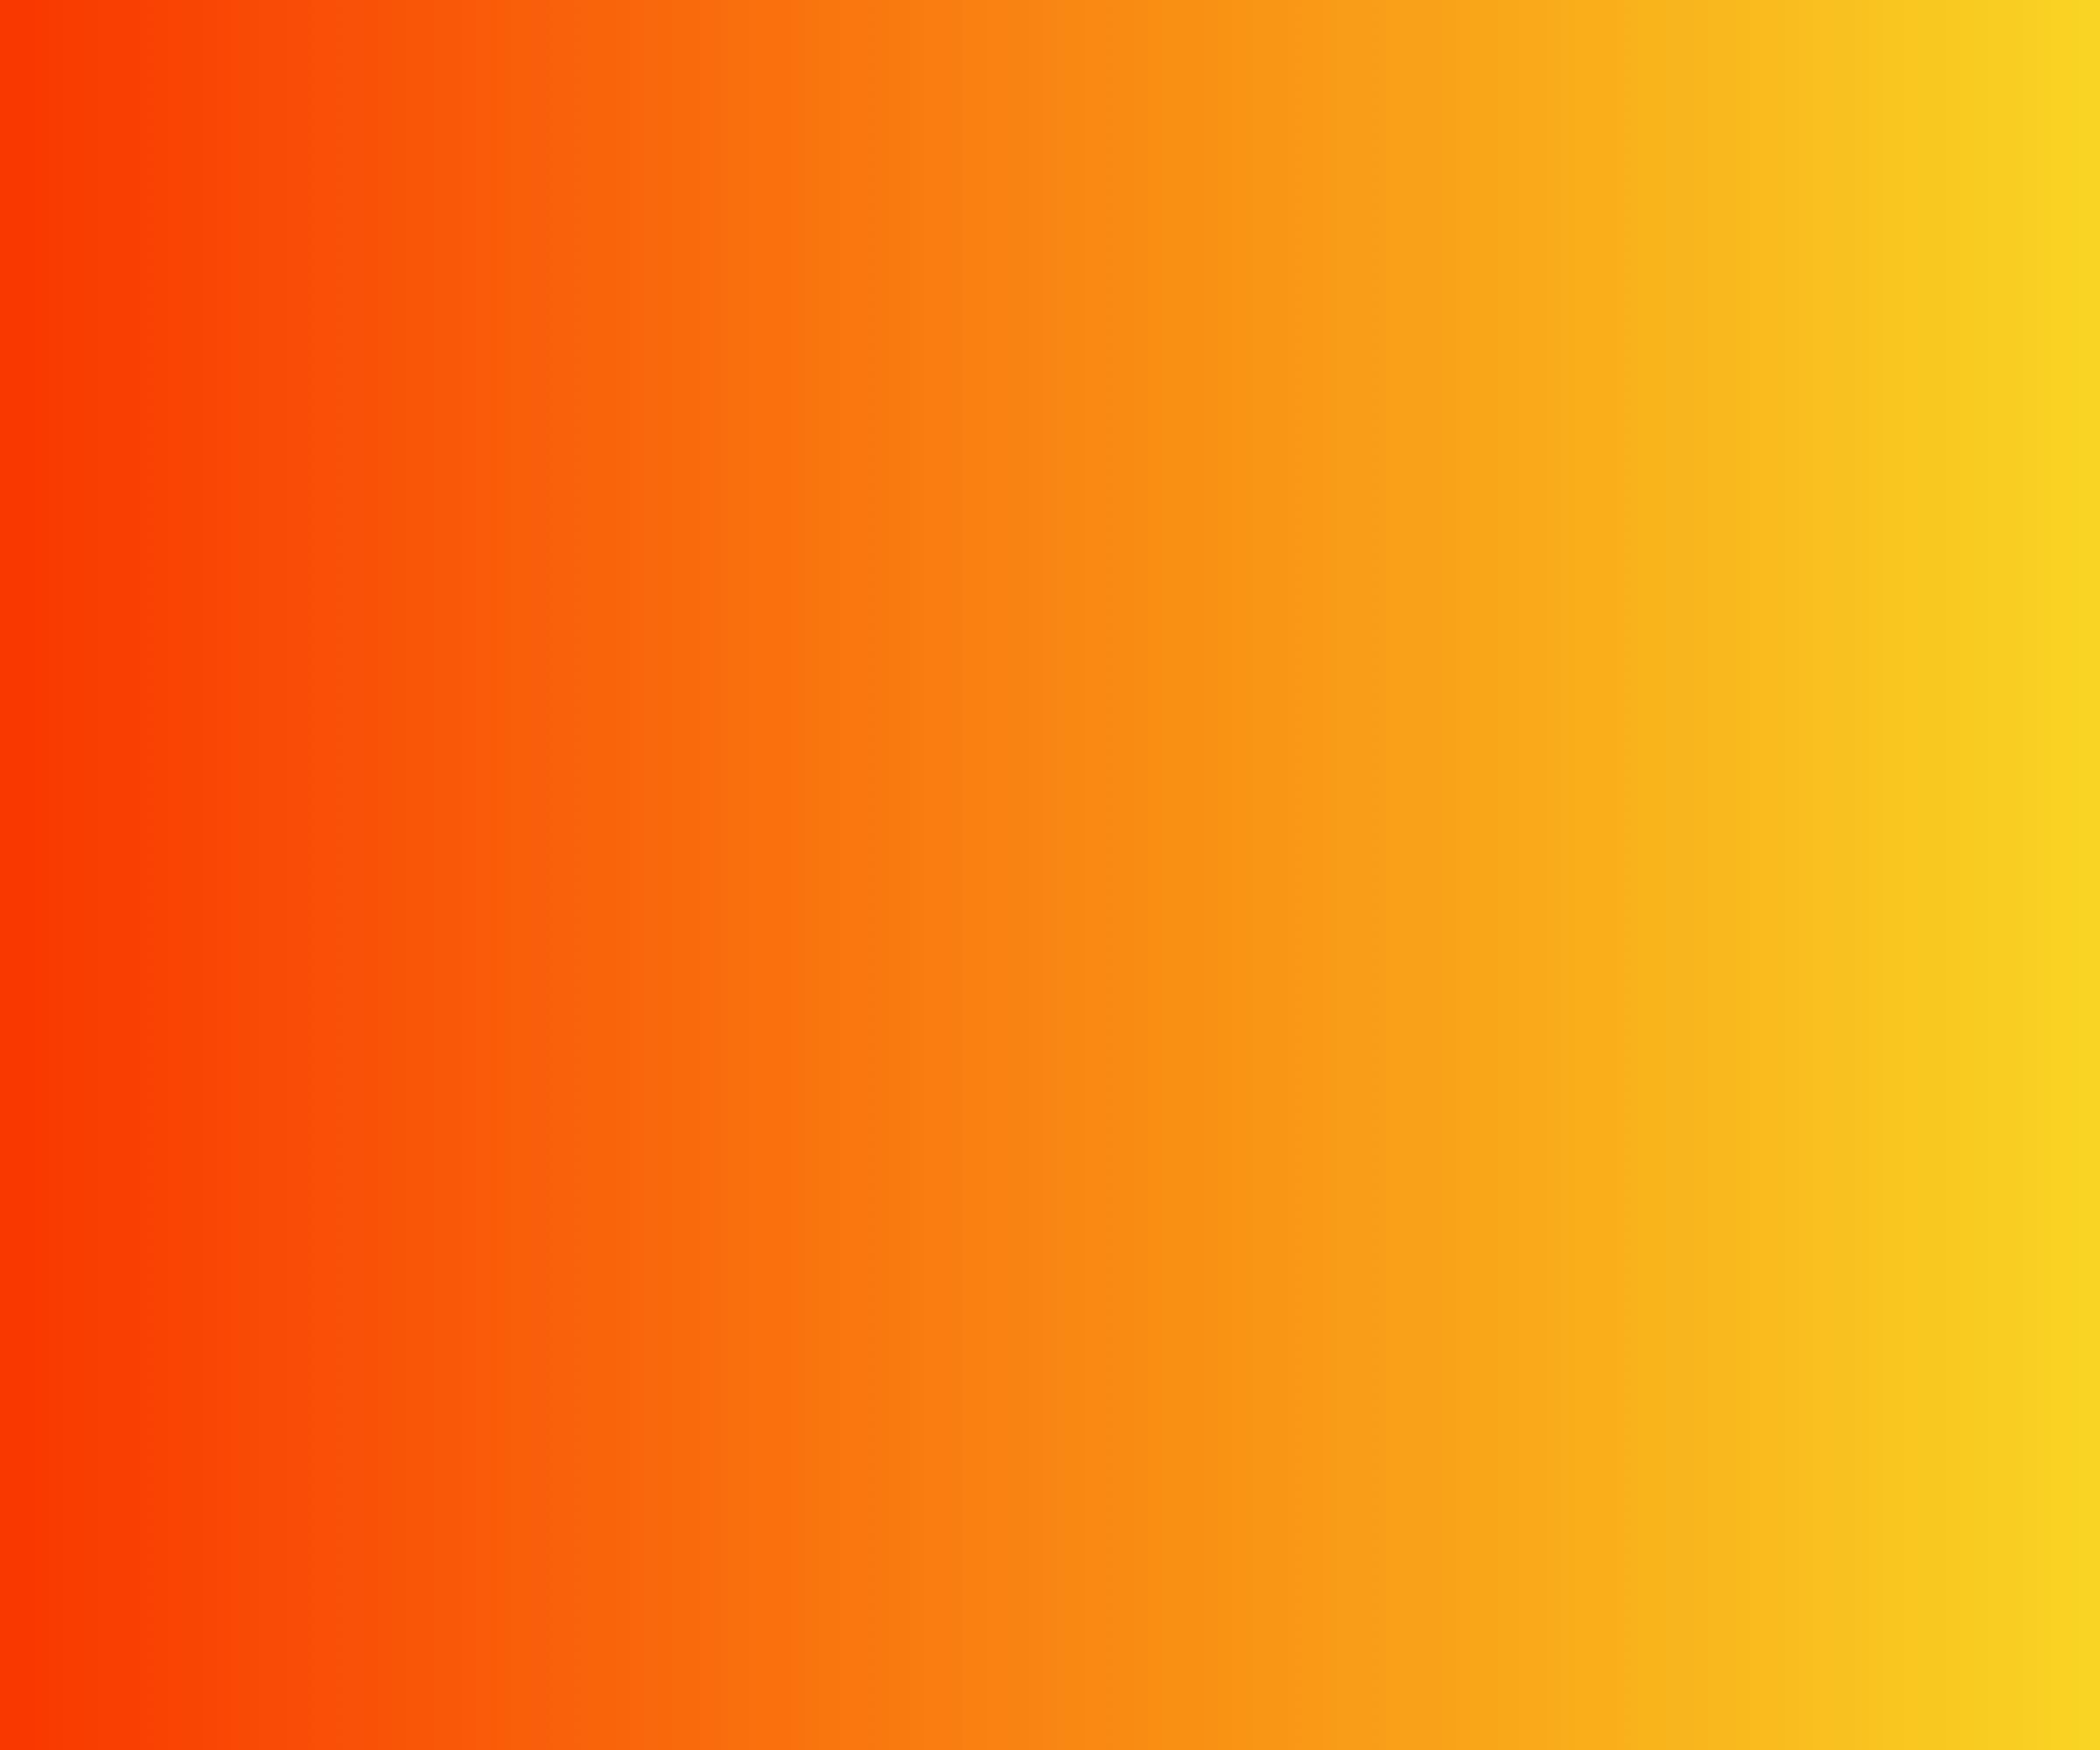 fresh background gradients webgradients com